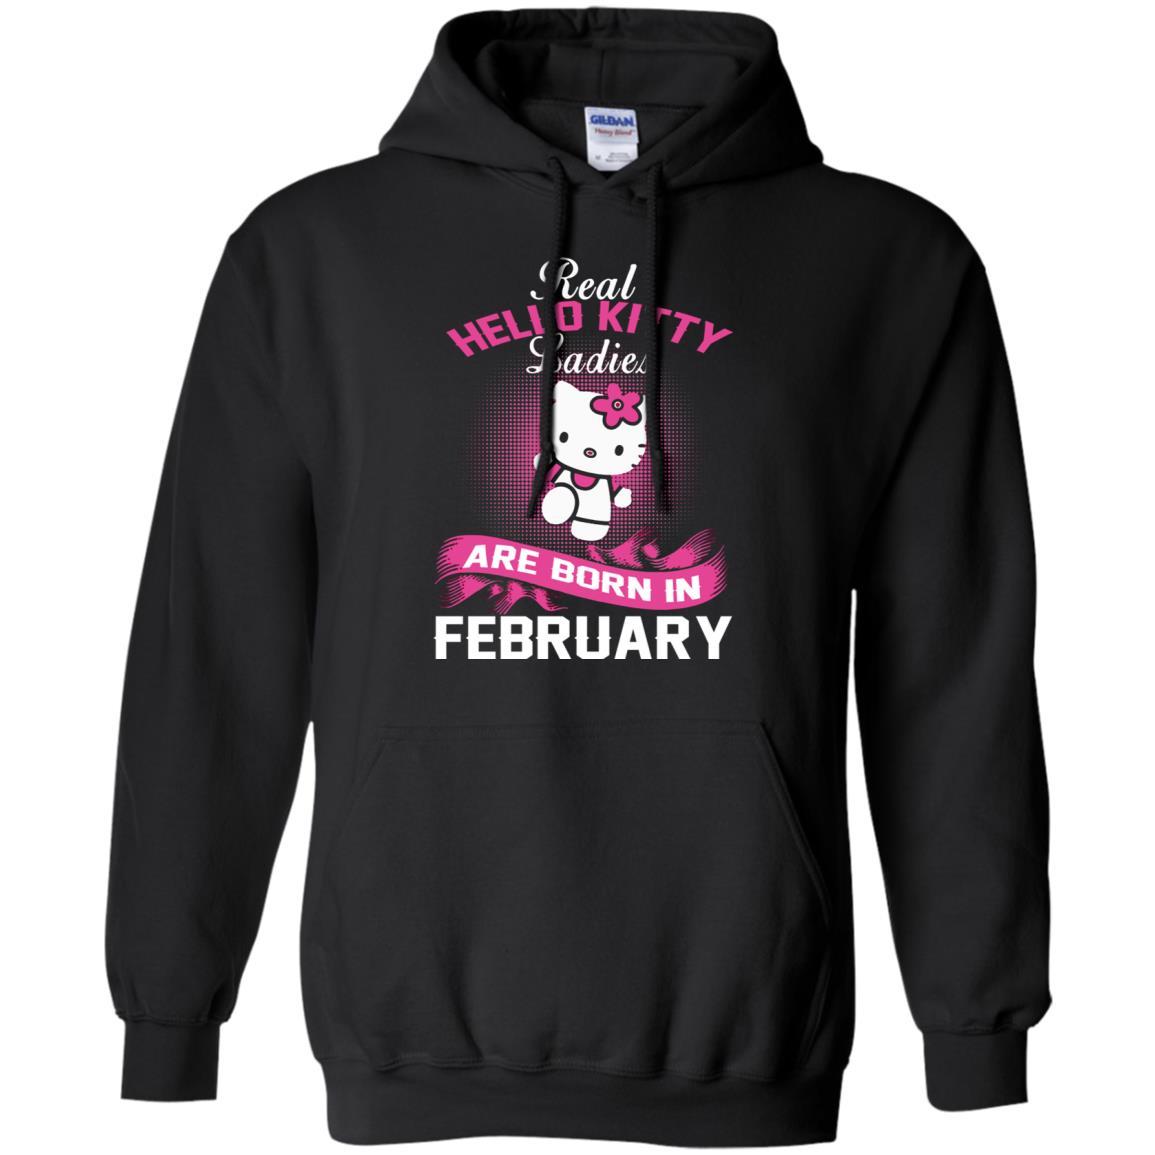 88f899c3472 Real Hello Kitty Ladies Born In February Hello Kitty T shirts Hoodies,  Sweatshirts